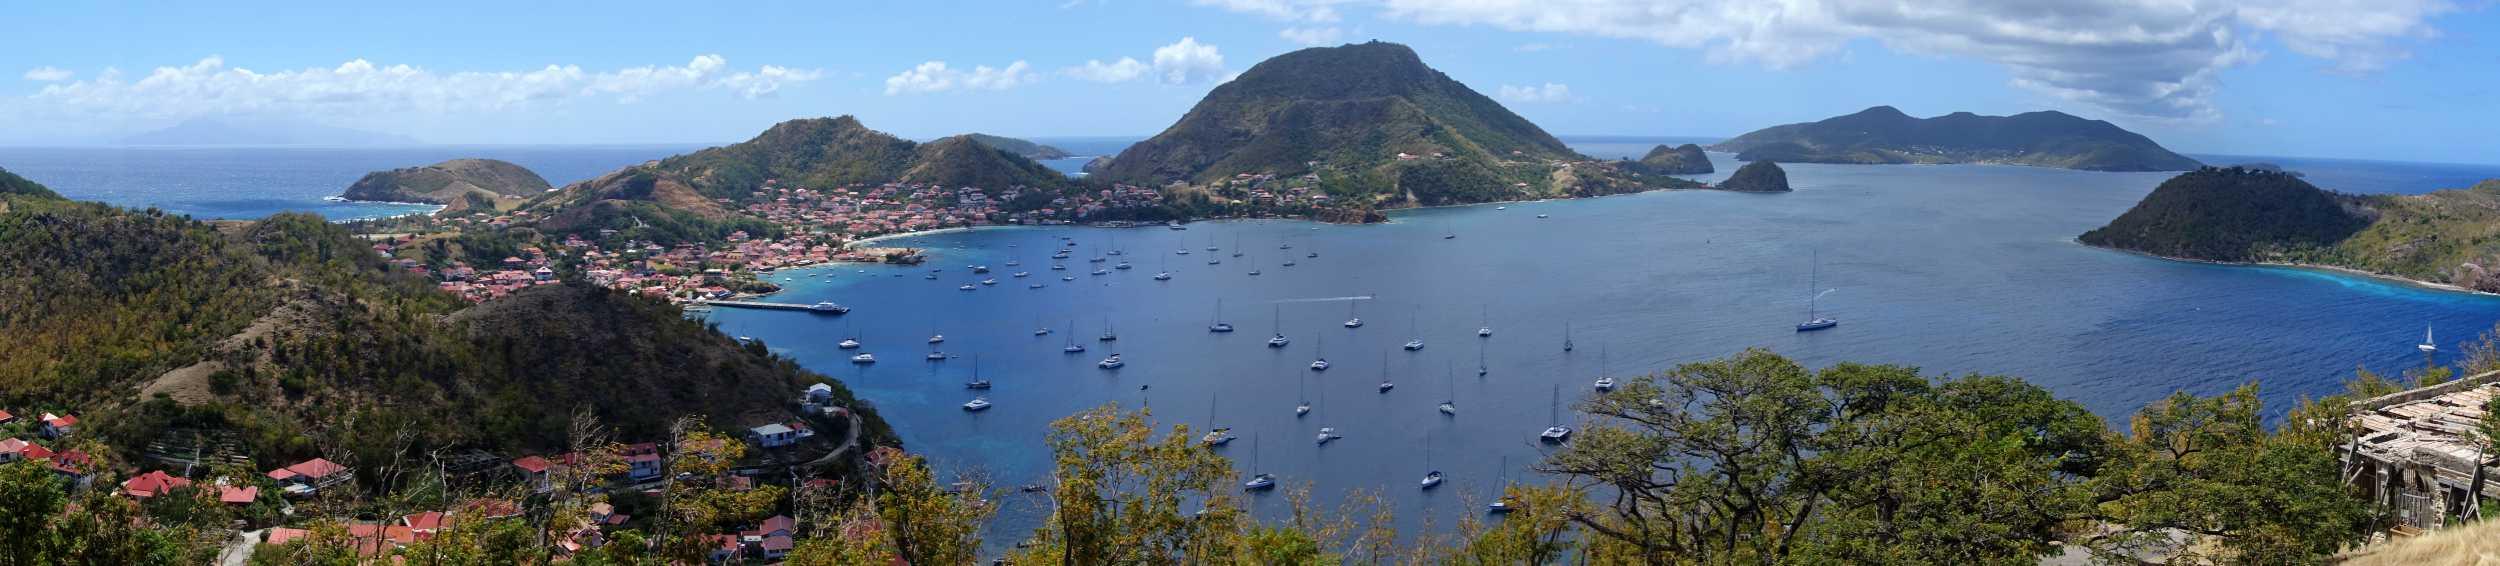 Location de bateau en Guadeloupe